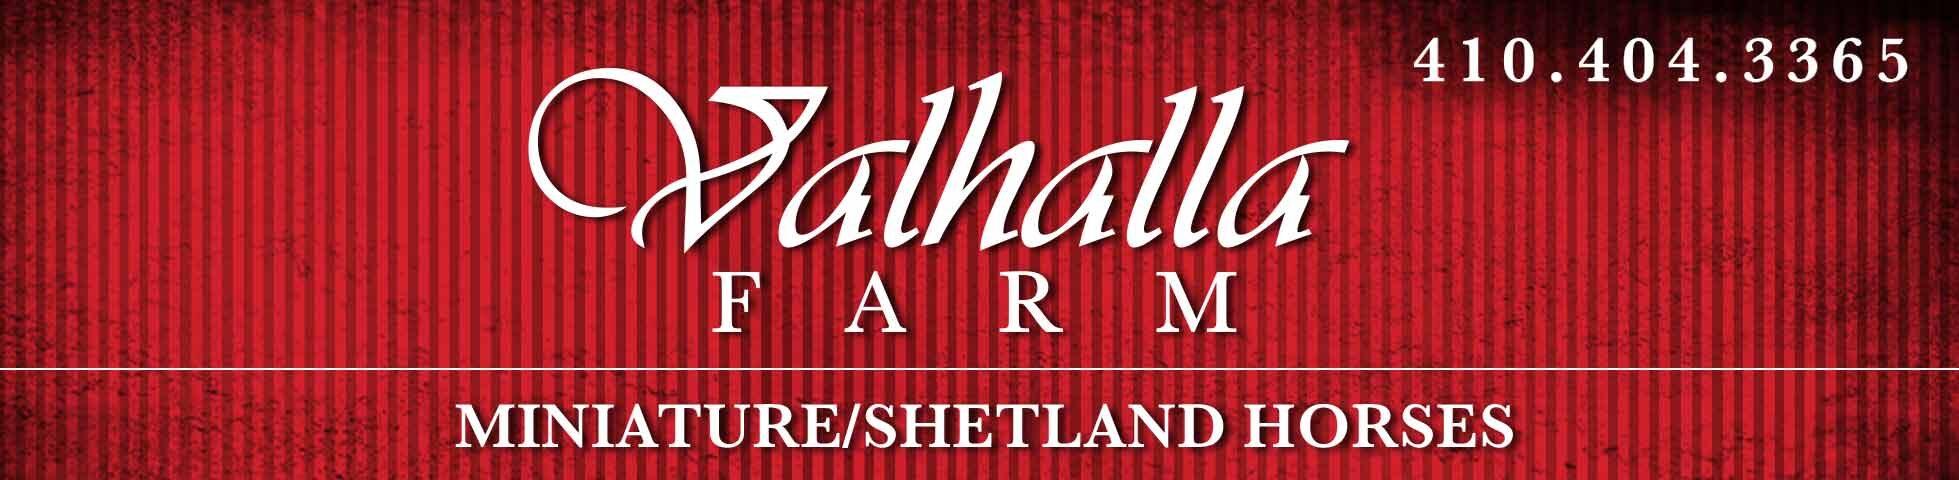 VALHALLA FARM, Minatures and Shetlands, Westminster, MD